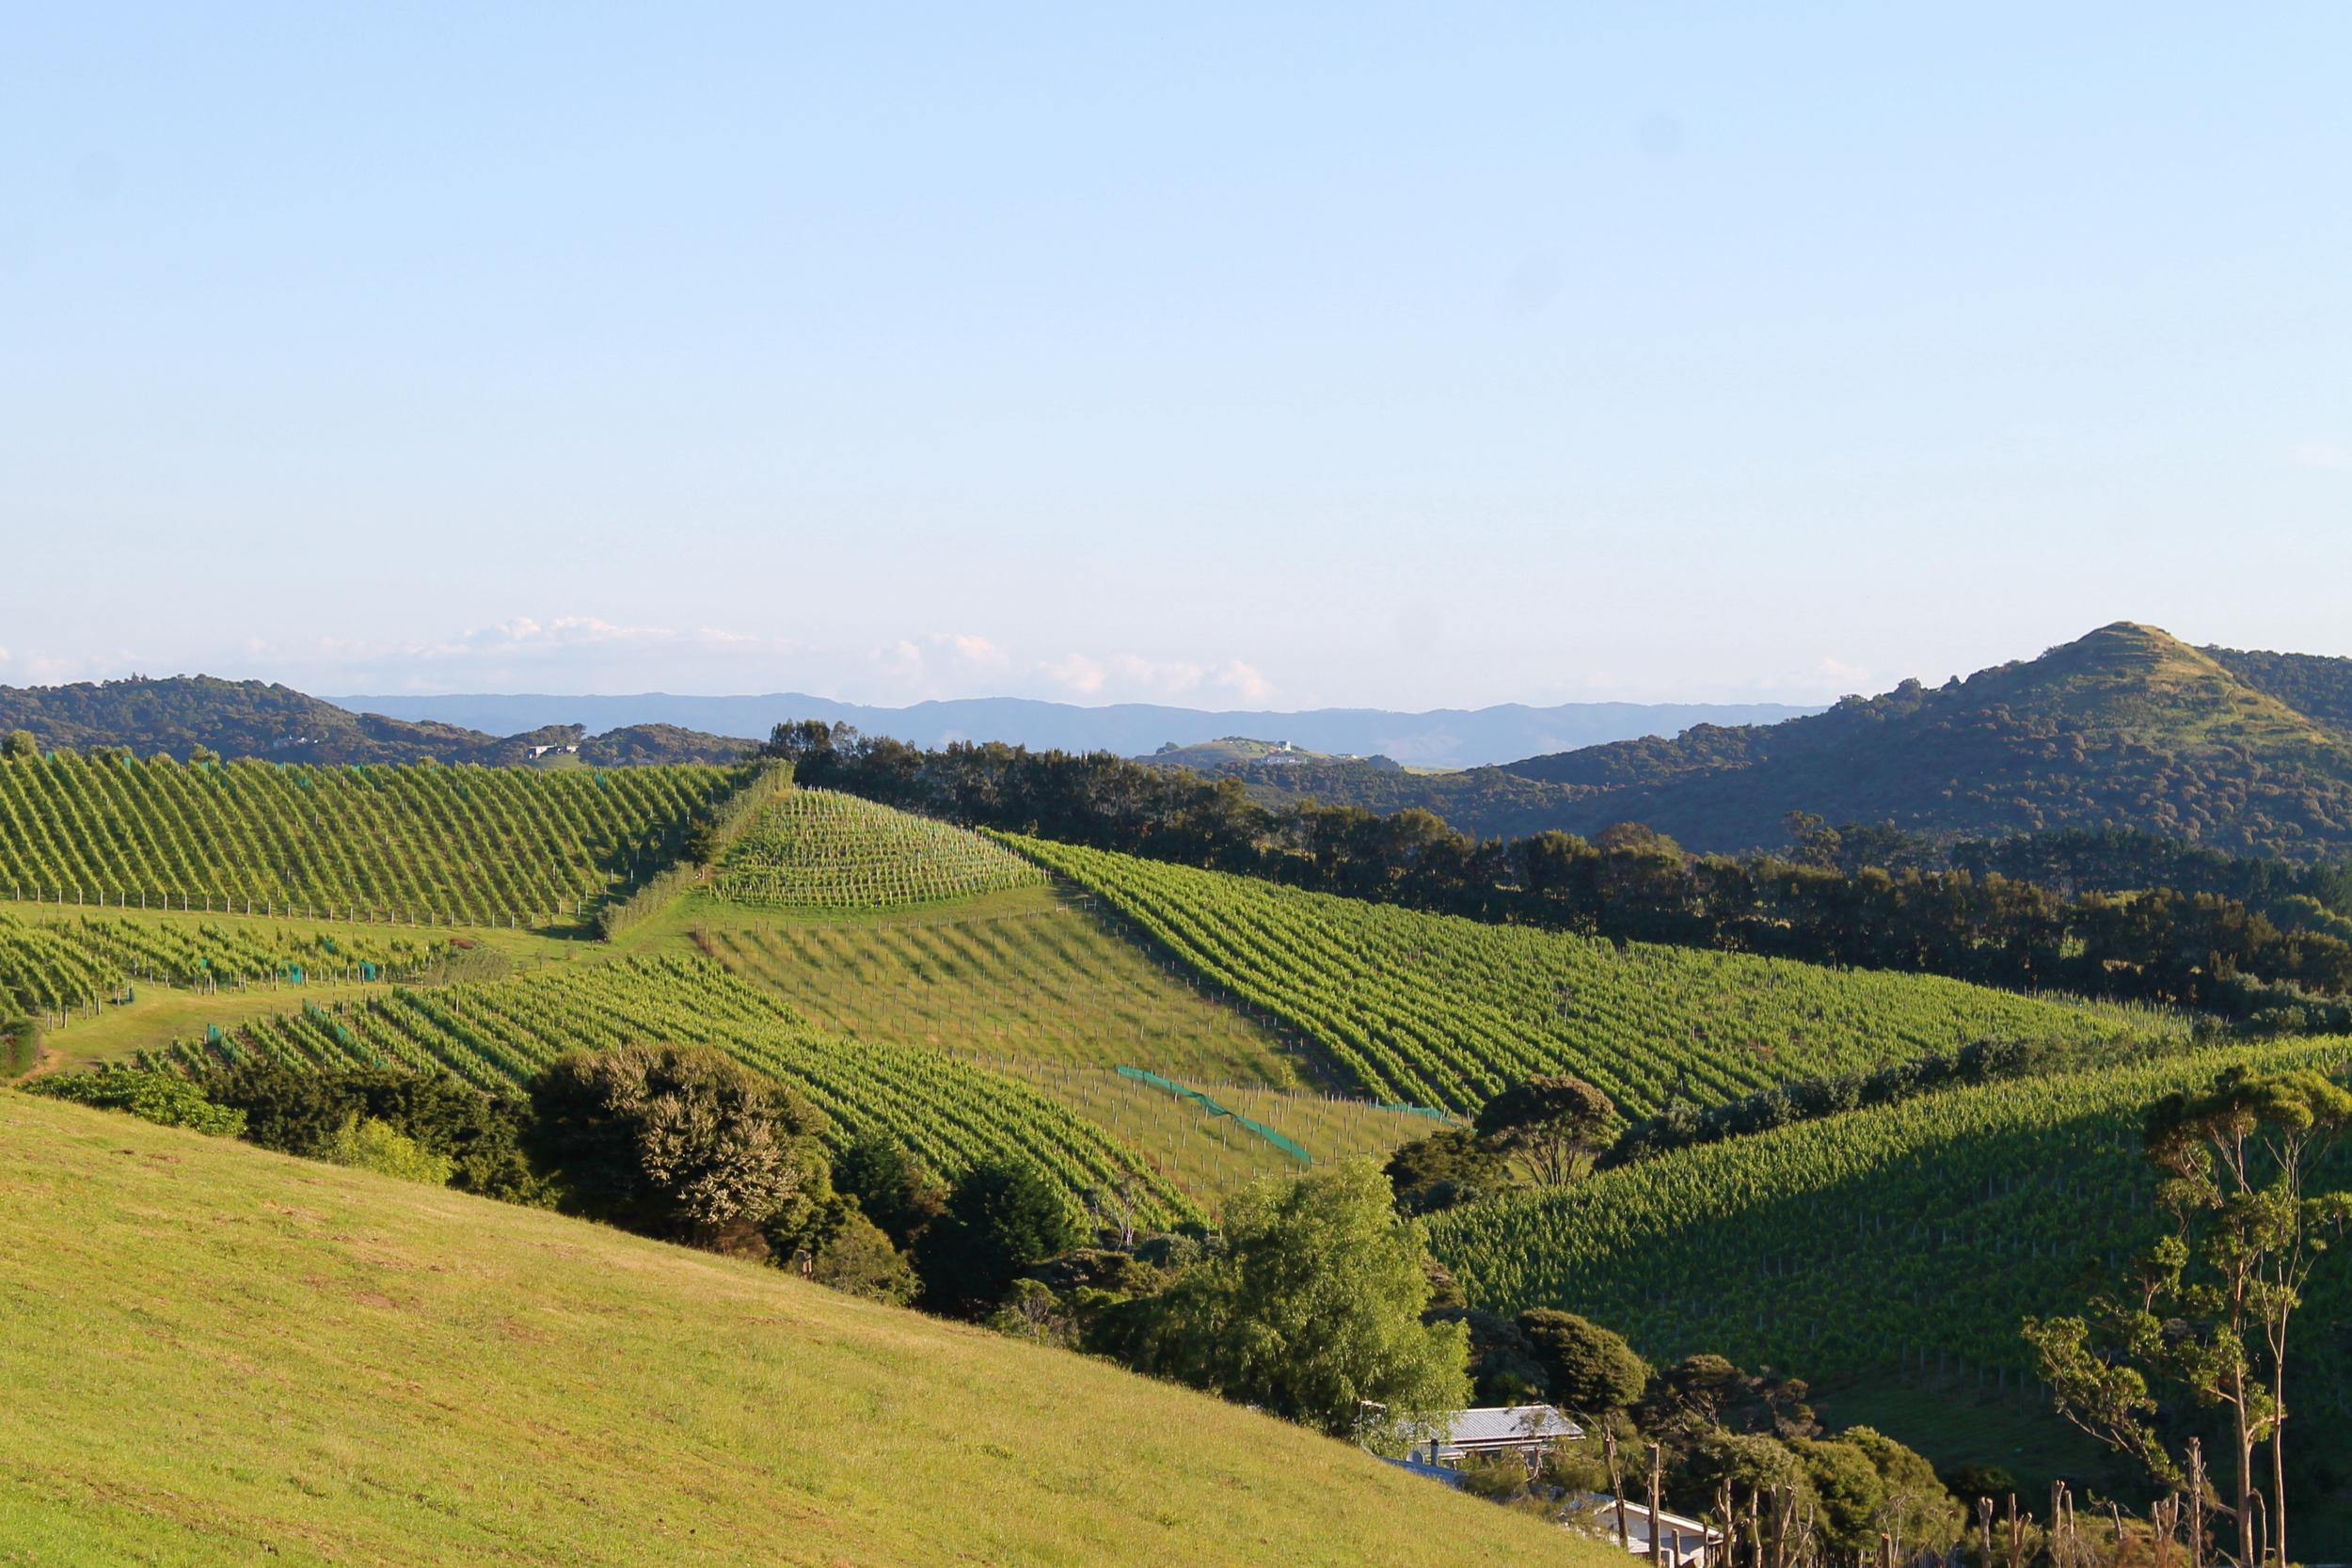 Vineyards in Waiheke.